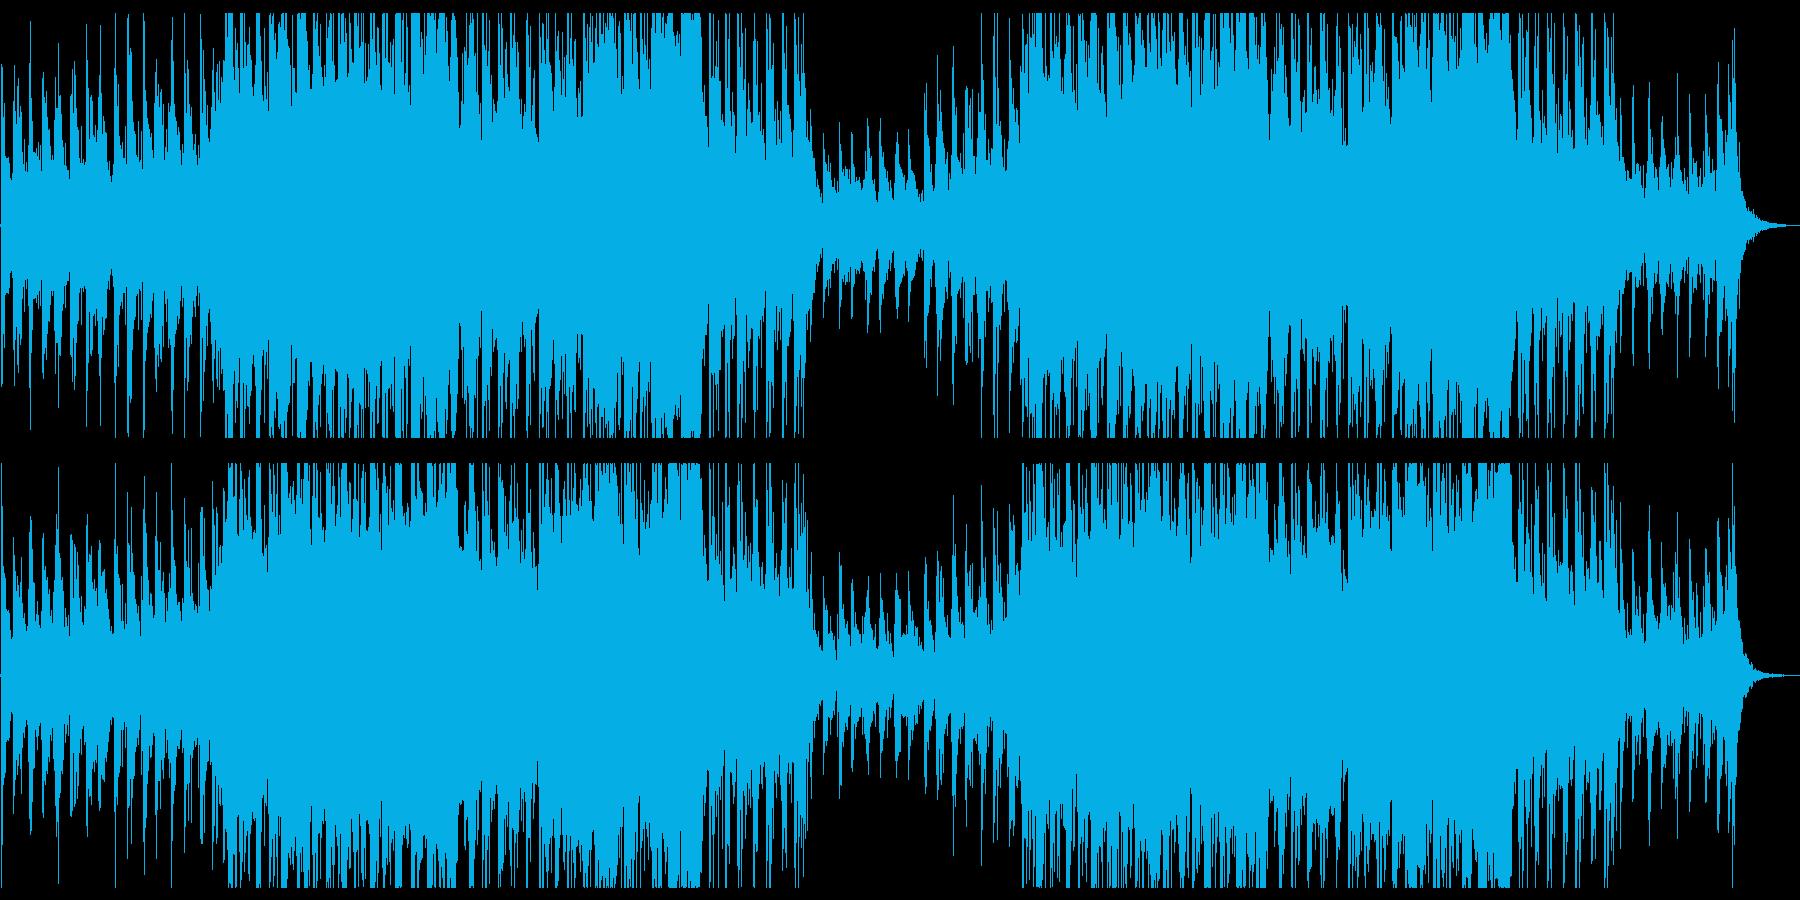 IronHeartの再生済みの波形